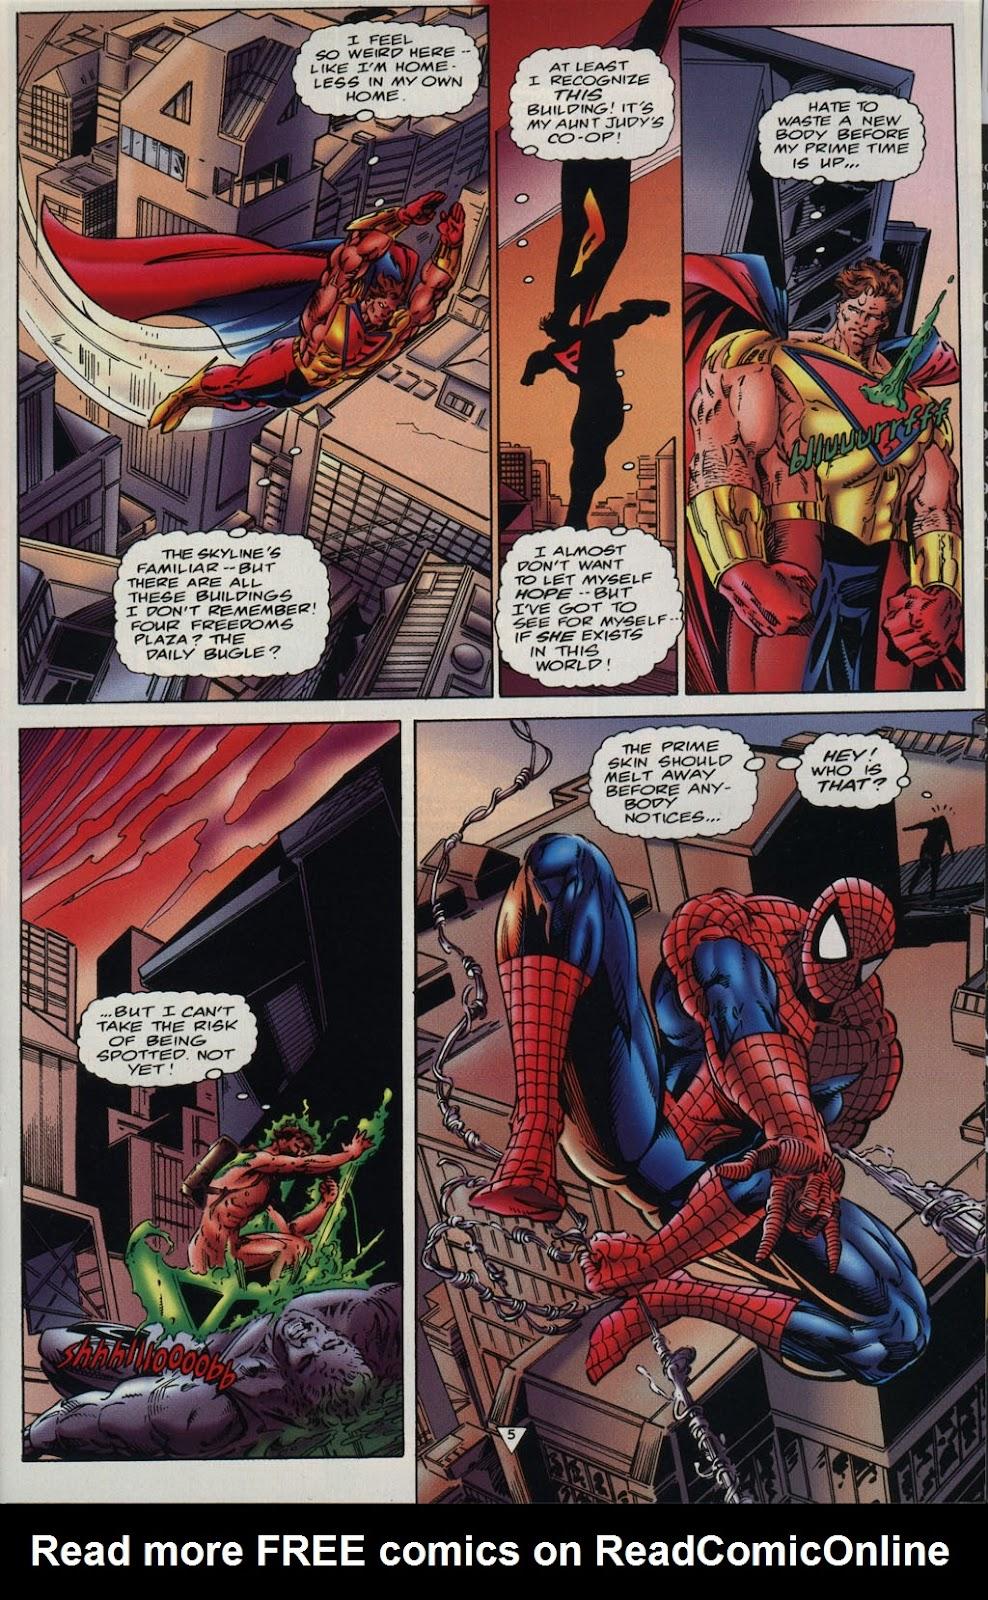 Read online Prime Vs. The Incredible Hulk comic -  Issue # Full - 8